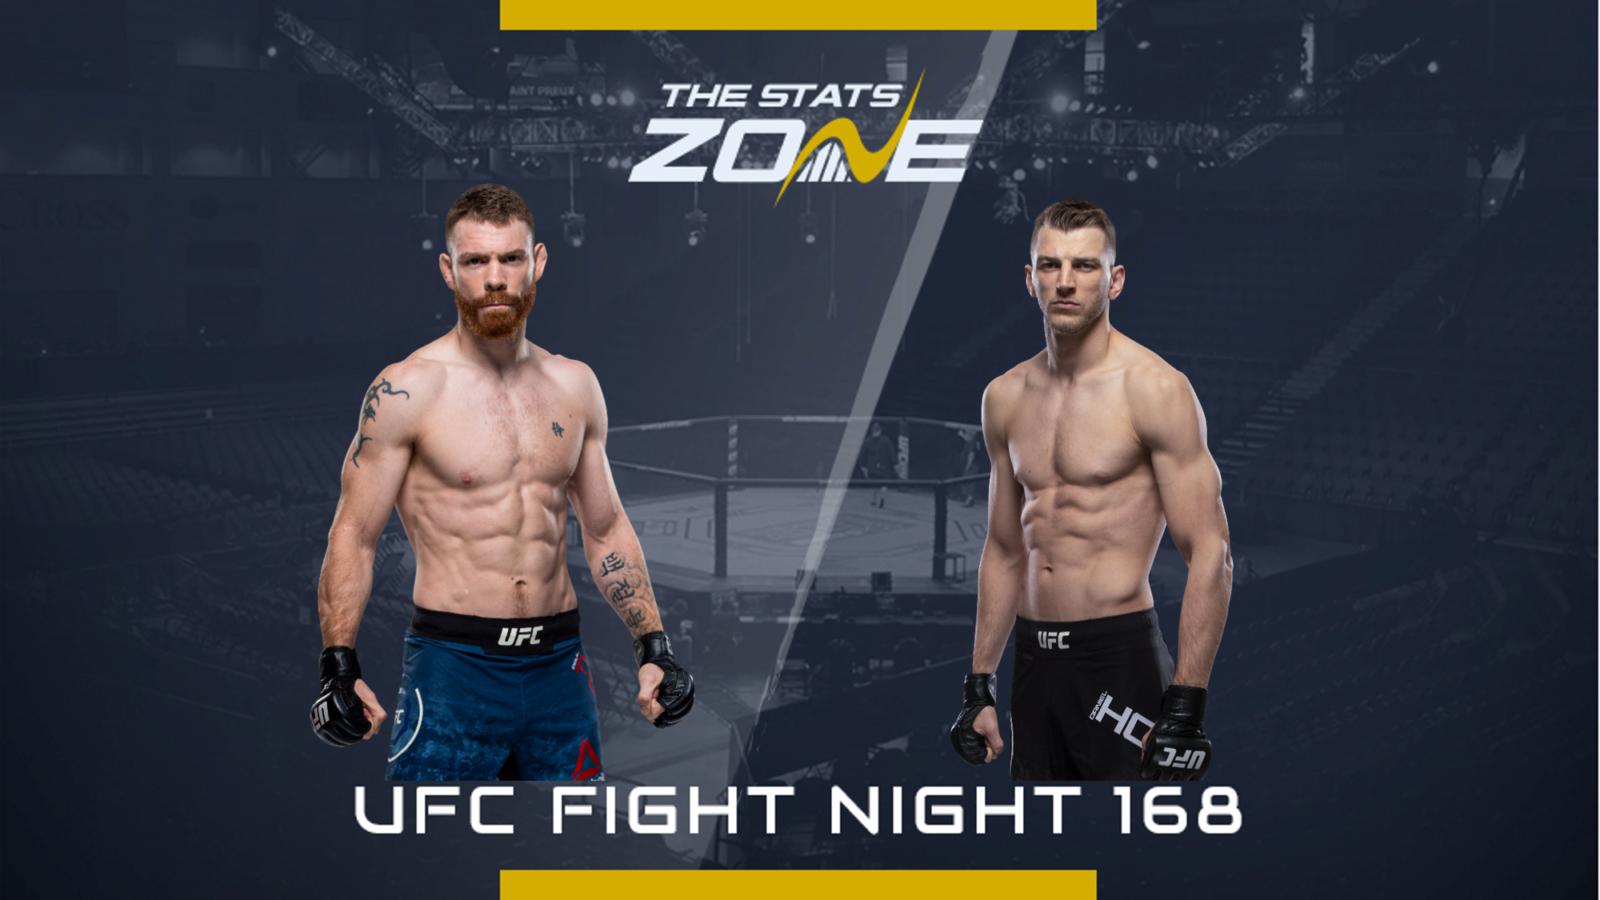 Mma Preview Paul Felder Vs Dan Hooker At Ufc Fight Night 168 The Stats Zone Watch ufc fight night 169 : paul felder vs dan hooker at ufc fight